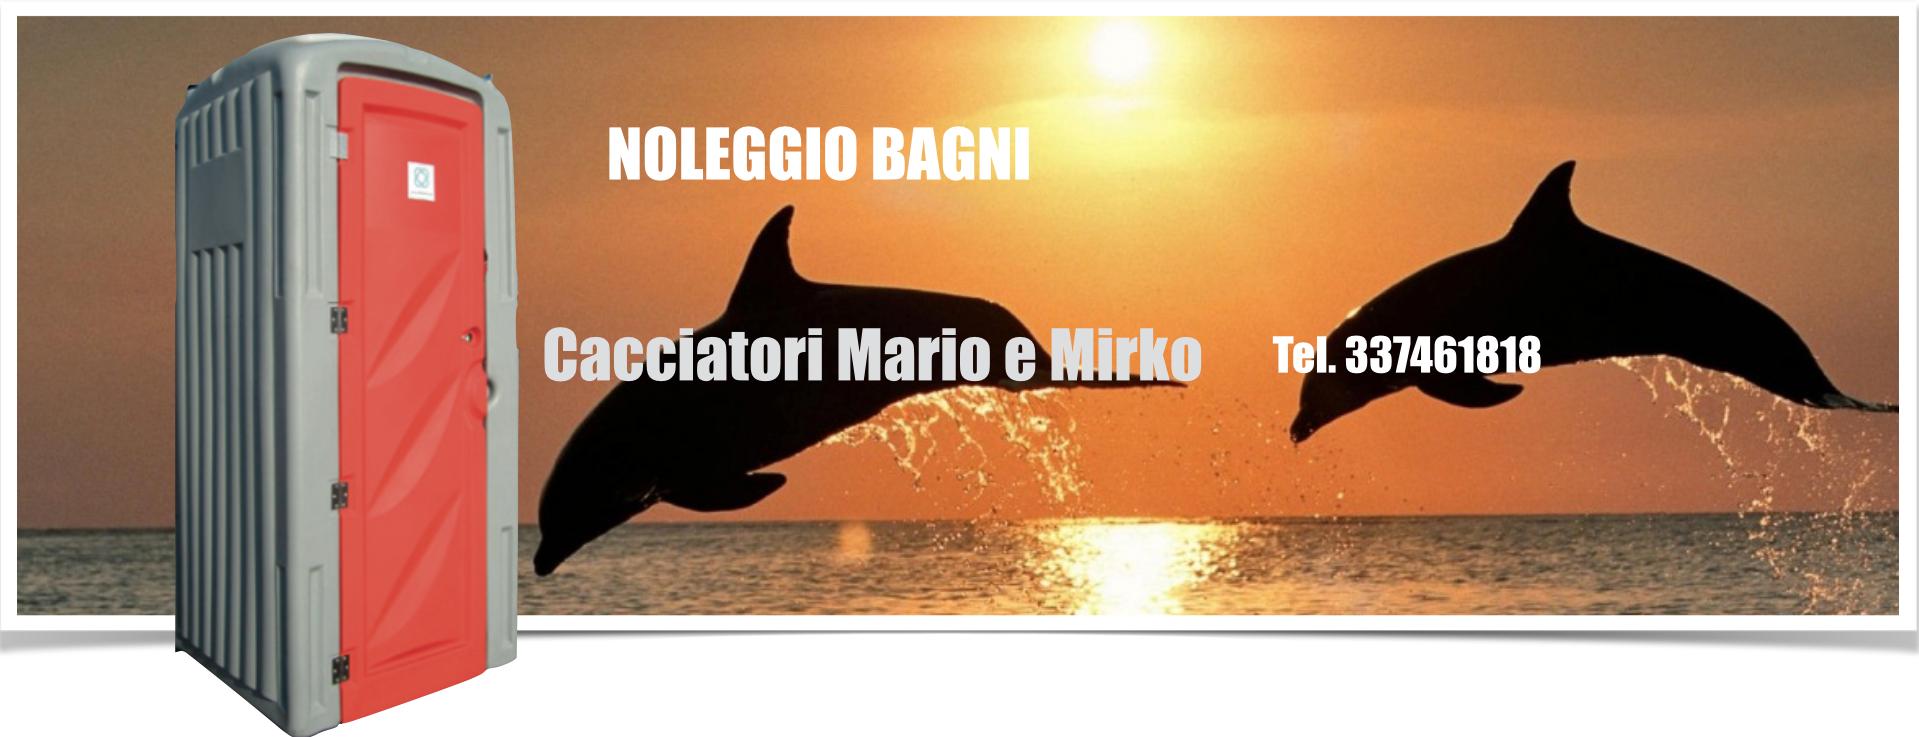 Noleggio Bagni in Provincia di Verona « Categories « NOLEGGIO ...